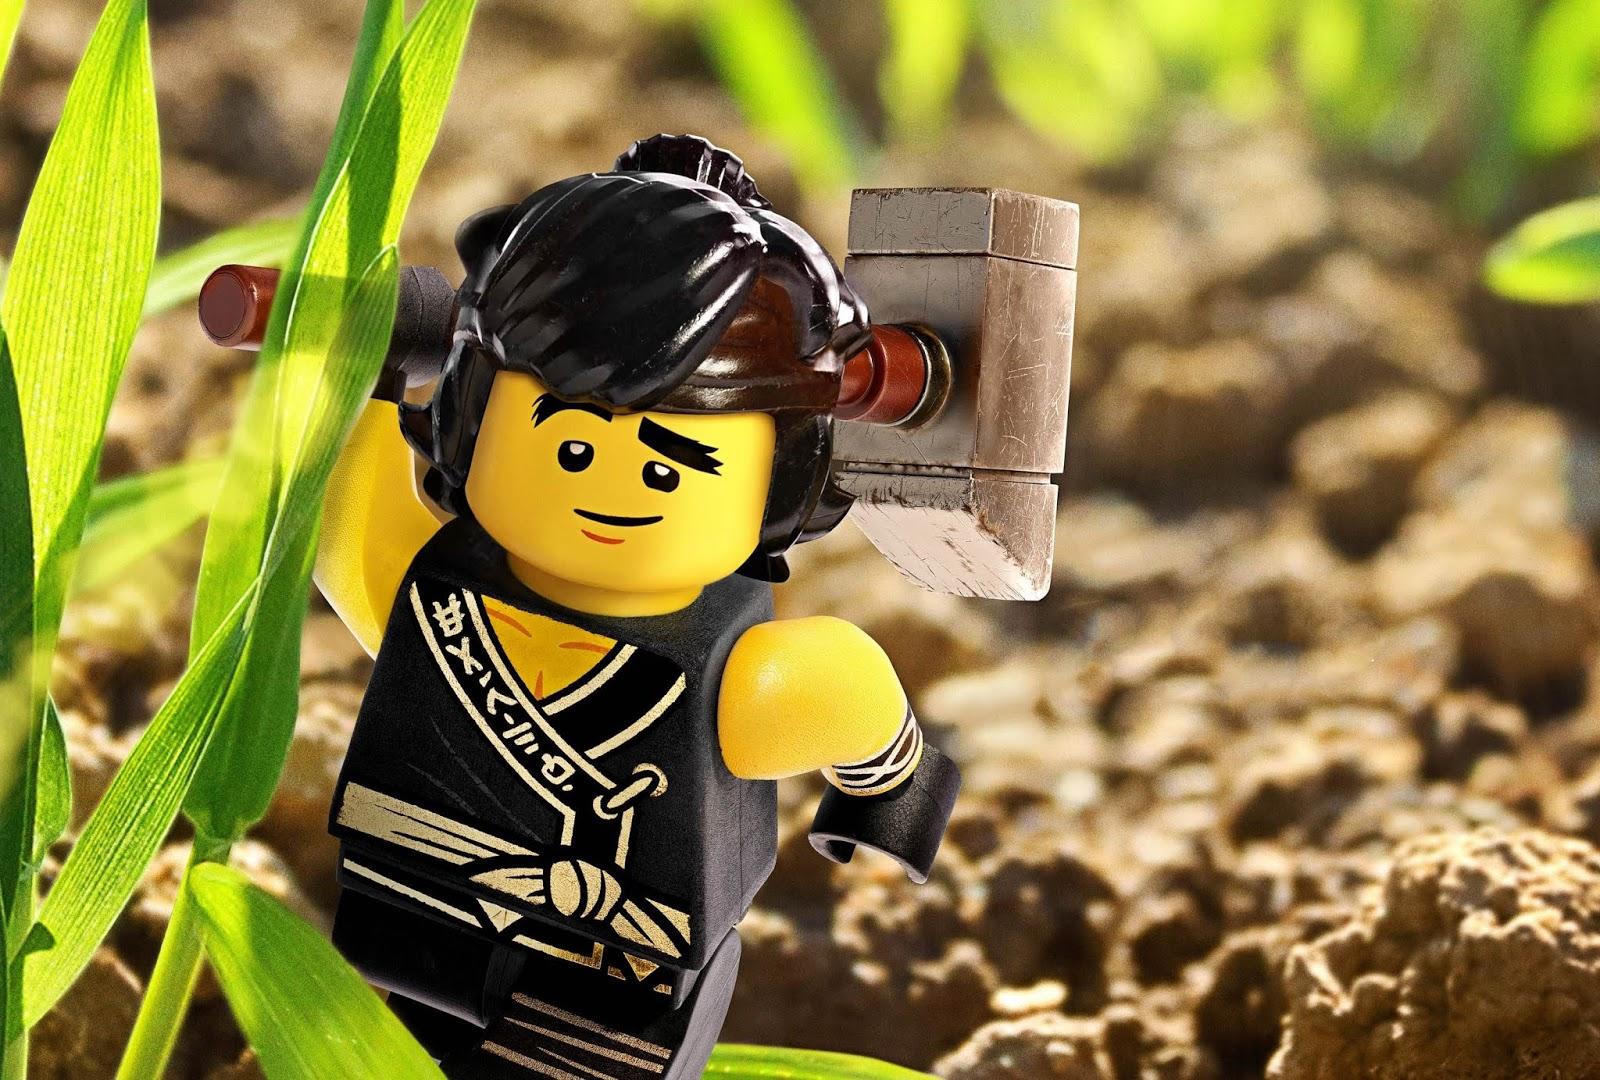 53 The Lego Ninjago Movie Wallpaper   WallpaperCarax